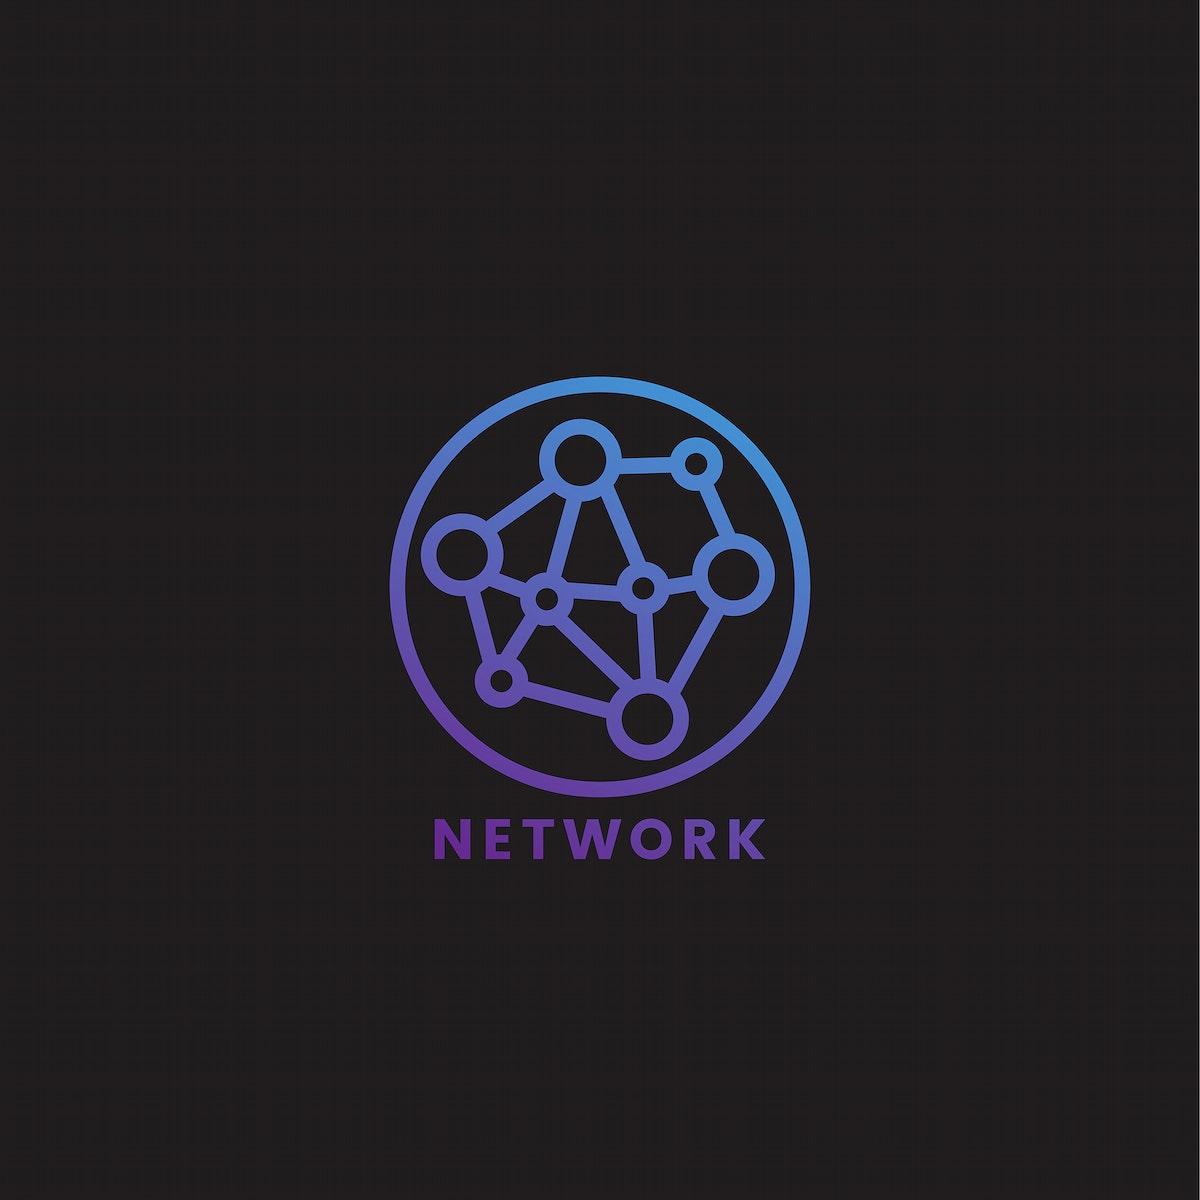 Computer network icon graphic illustration